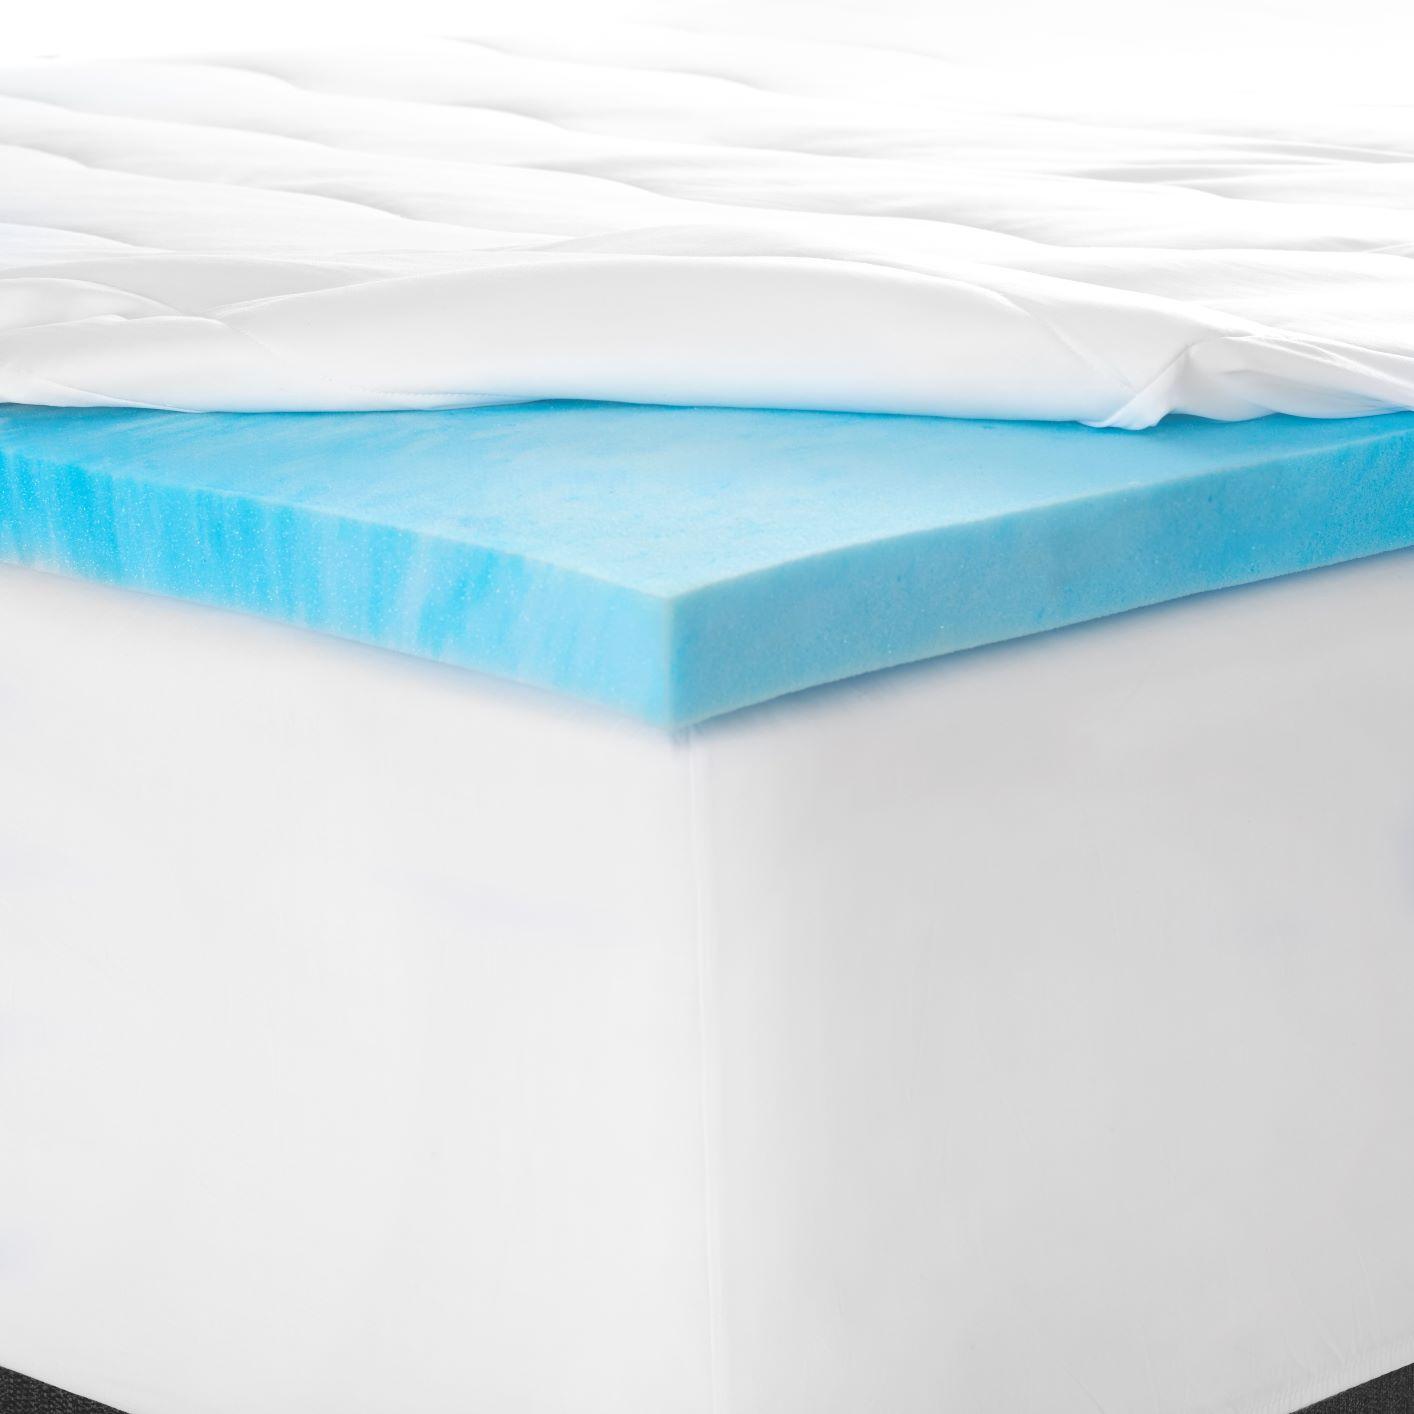 Therapedic® SleepRX™ 3inch Cooling Mattress Topper